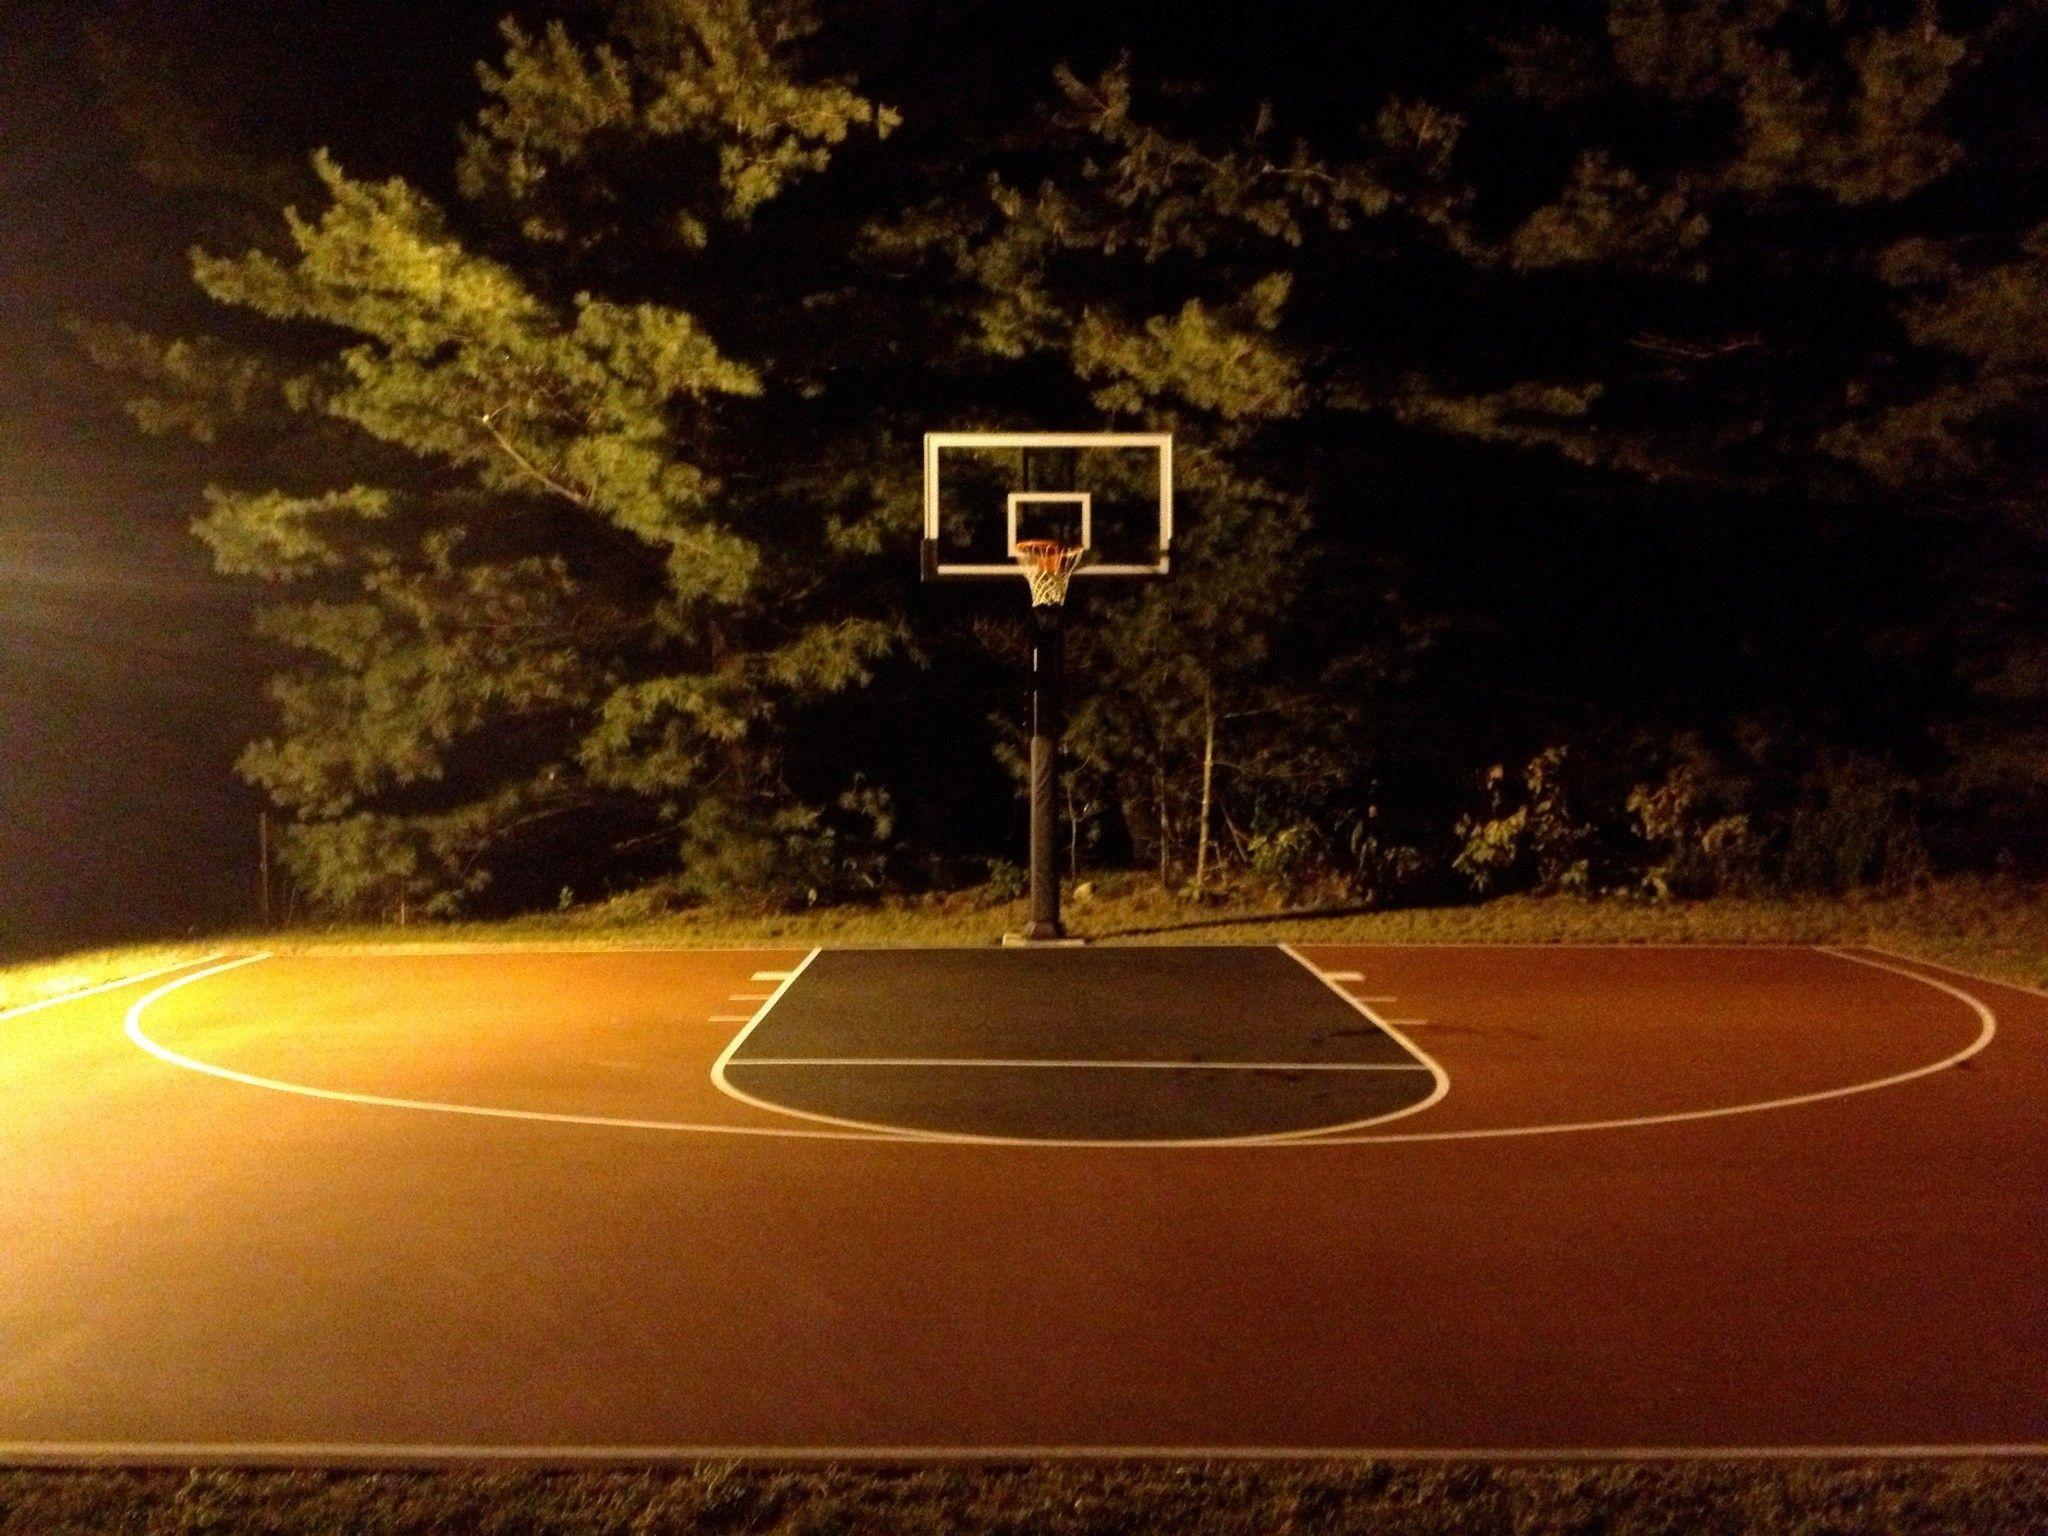 Basketball Court Wallpapers Hd Wallpaper Cave